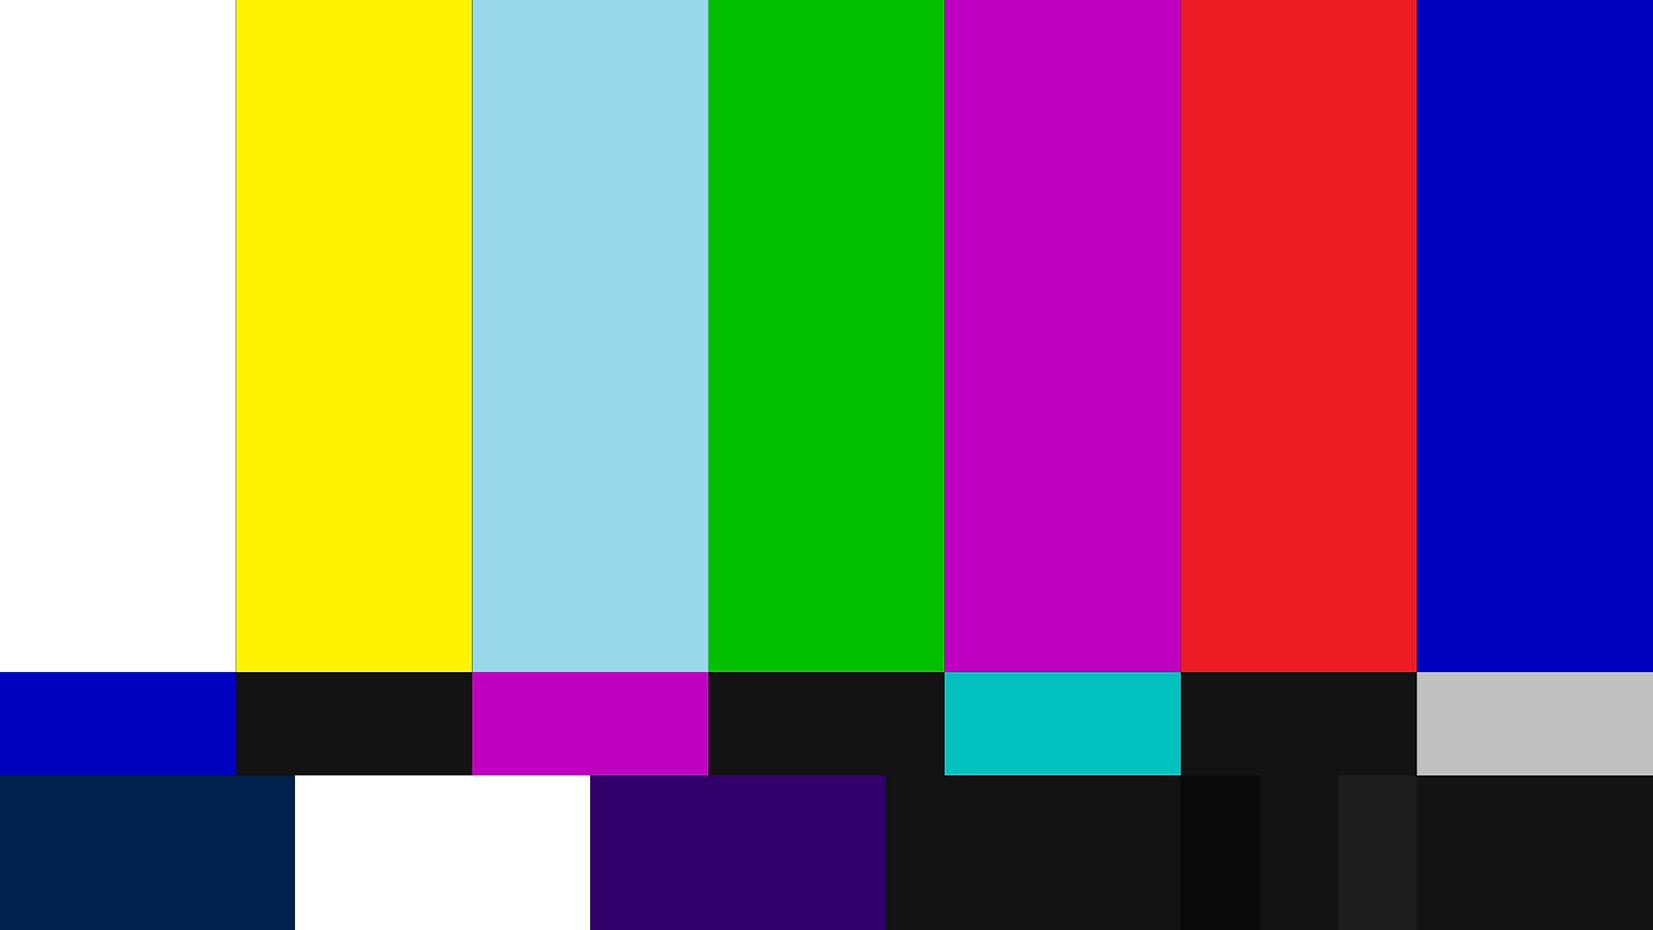 TV-abstract-test-patterns-1361441-wallhe